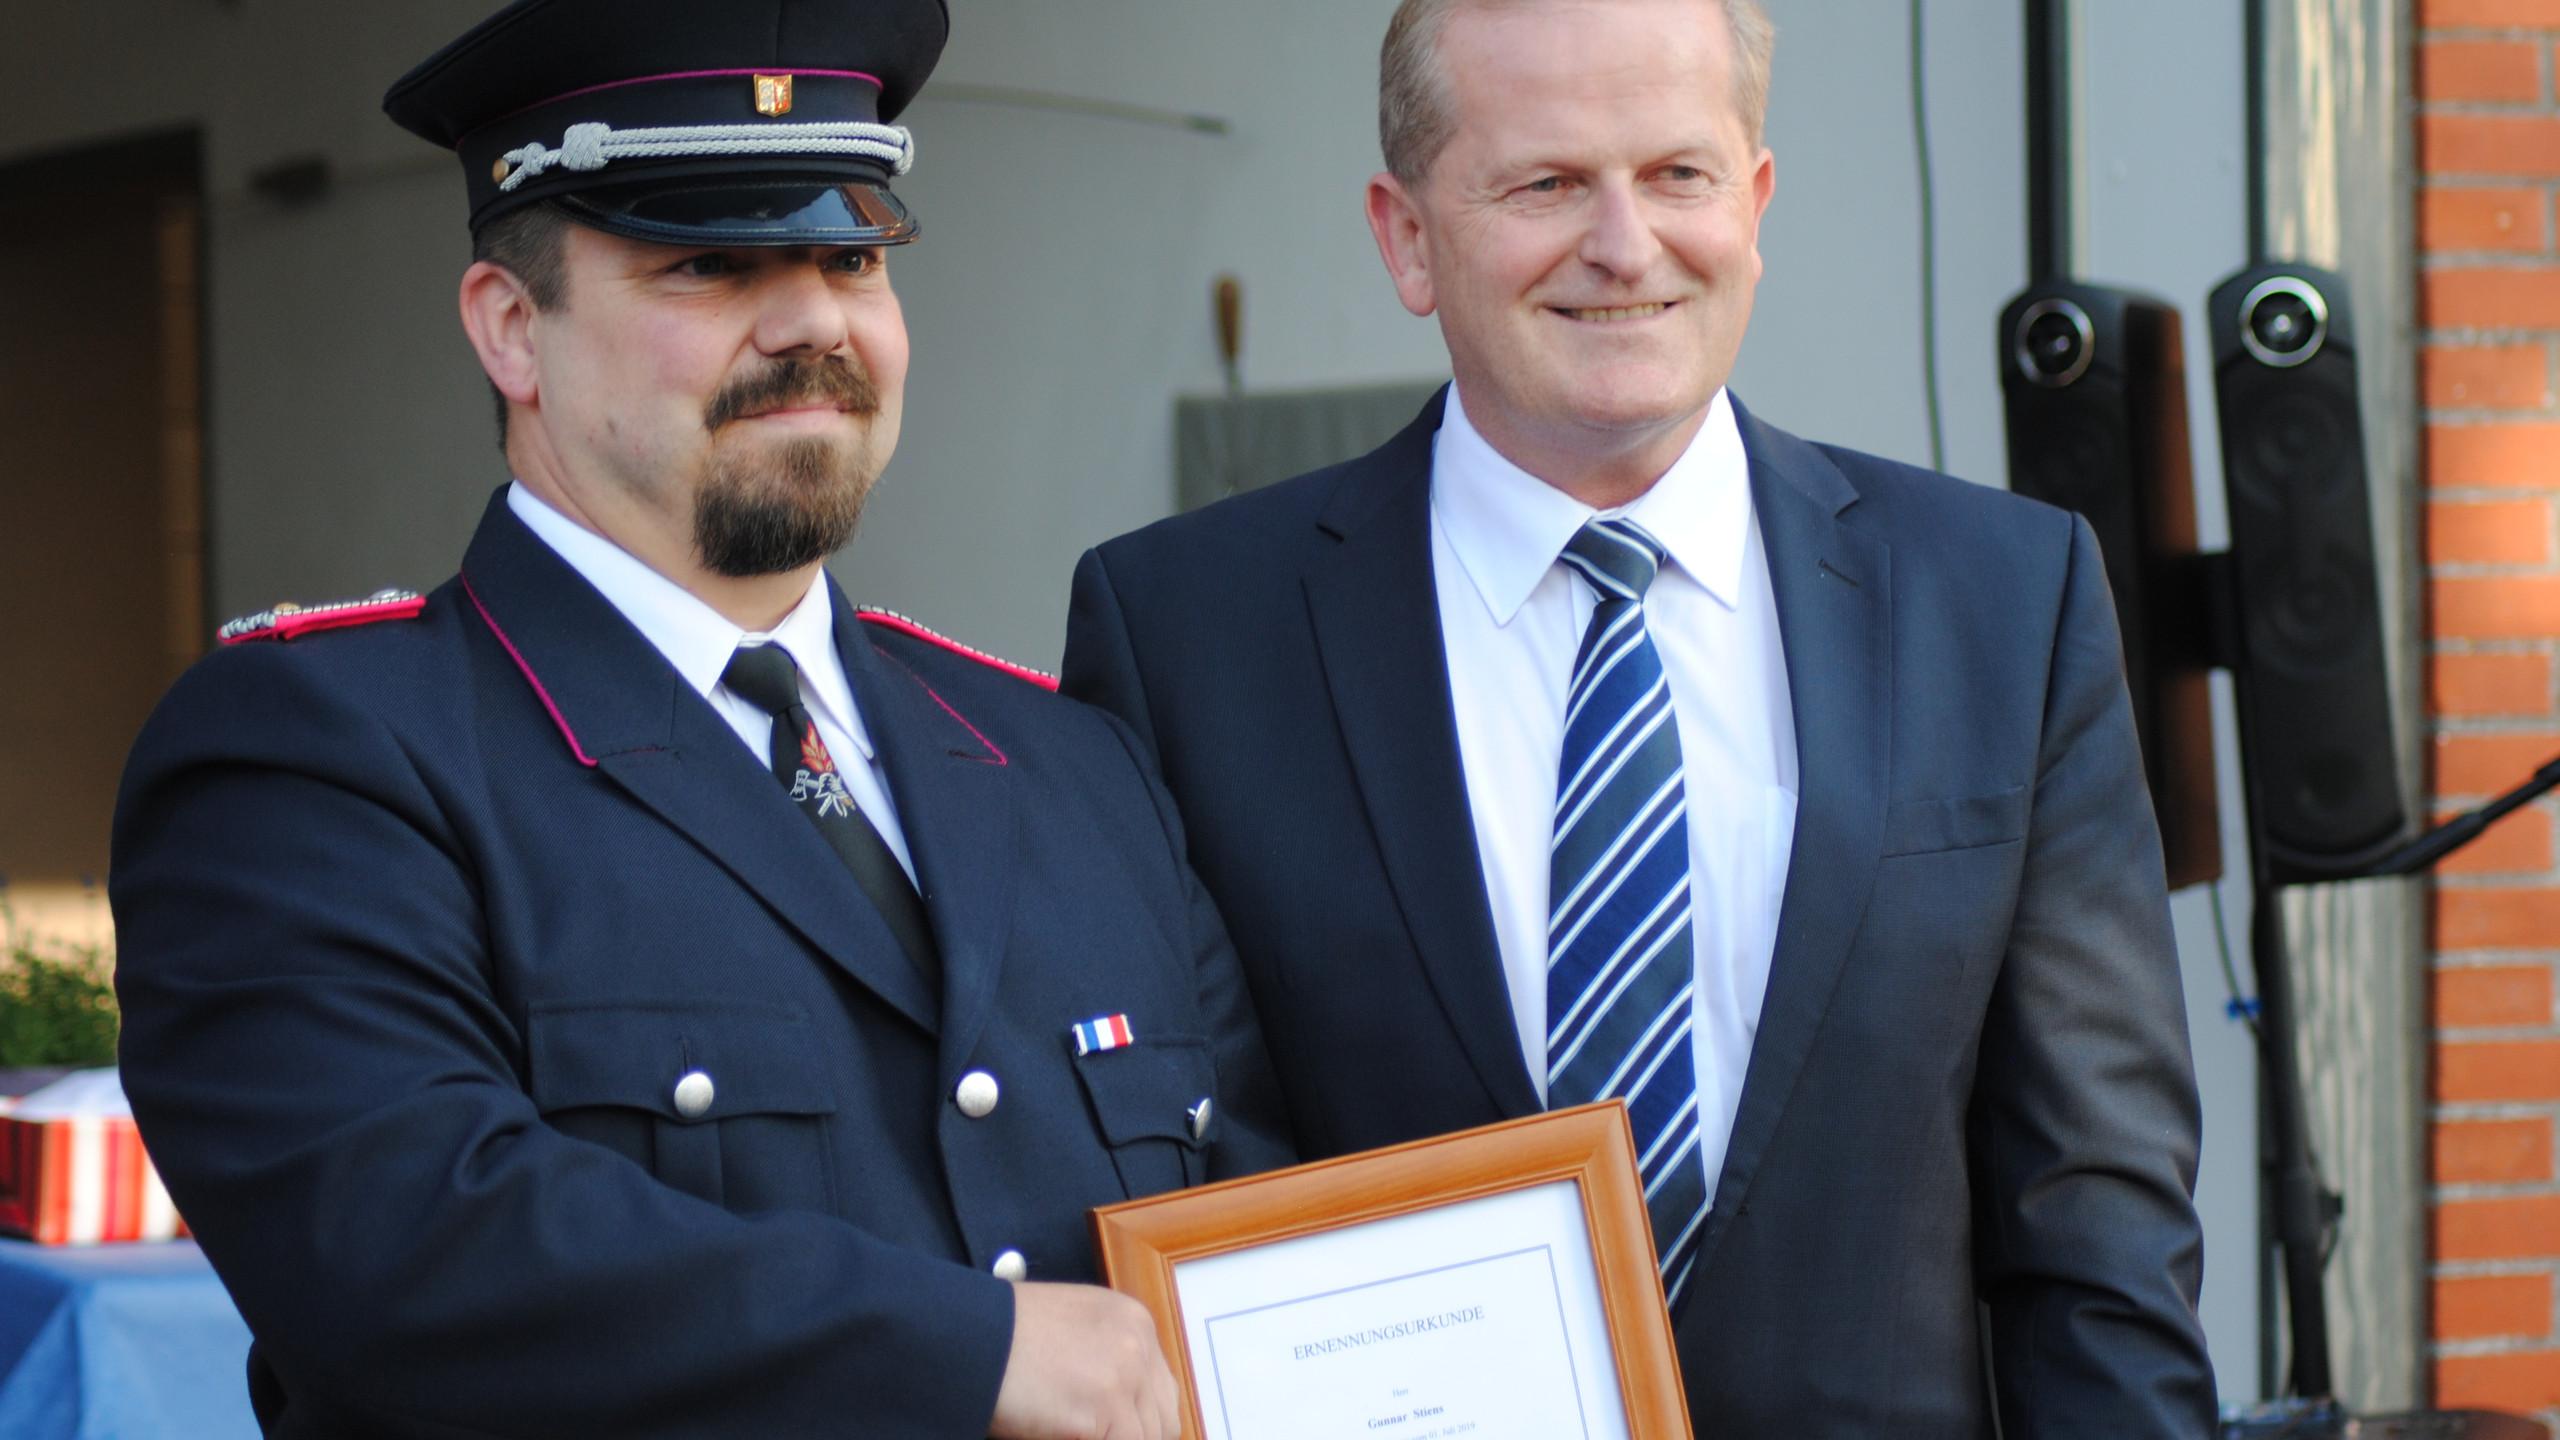 (links) Wehrführer Gunnar Stiens, (rechts) Bürgermeister Thorsten Klinger